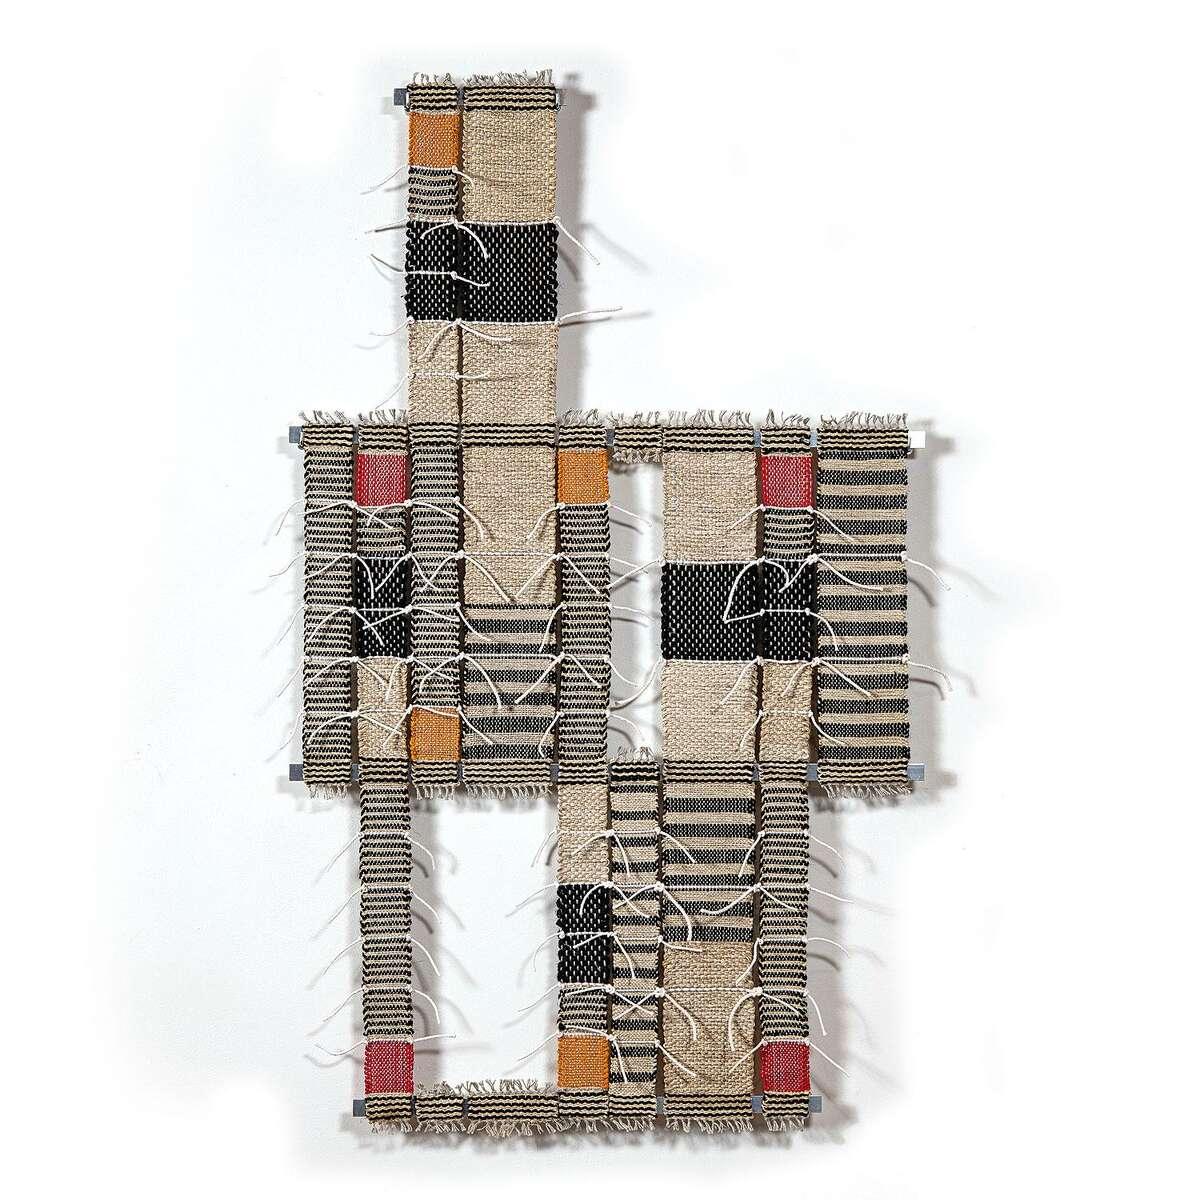 """Pangaea"" by Blair Tate is on display at browngrotta arts."